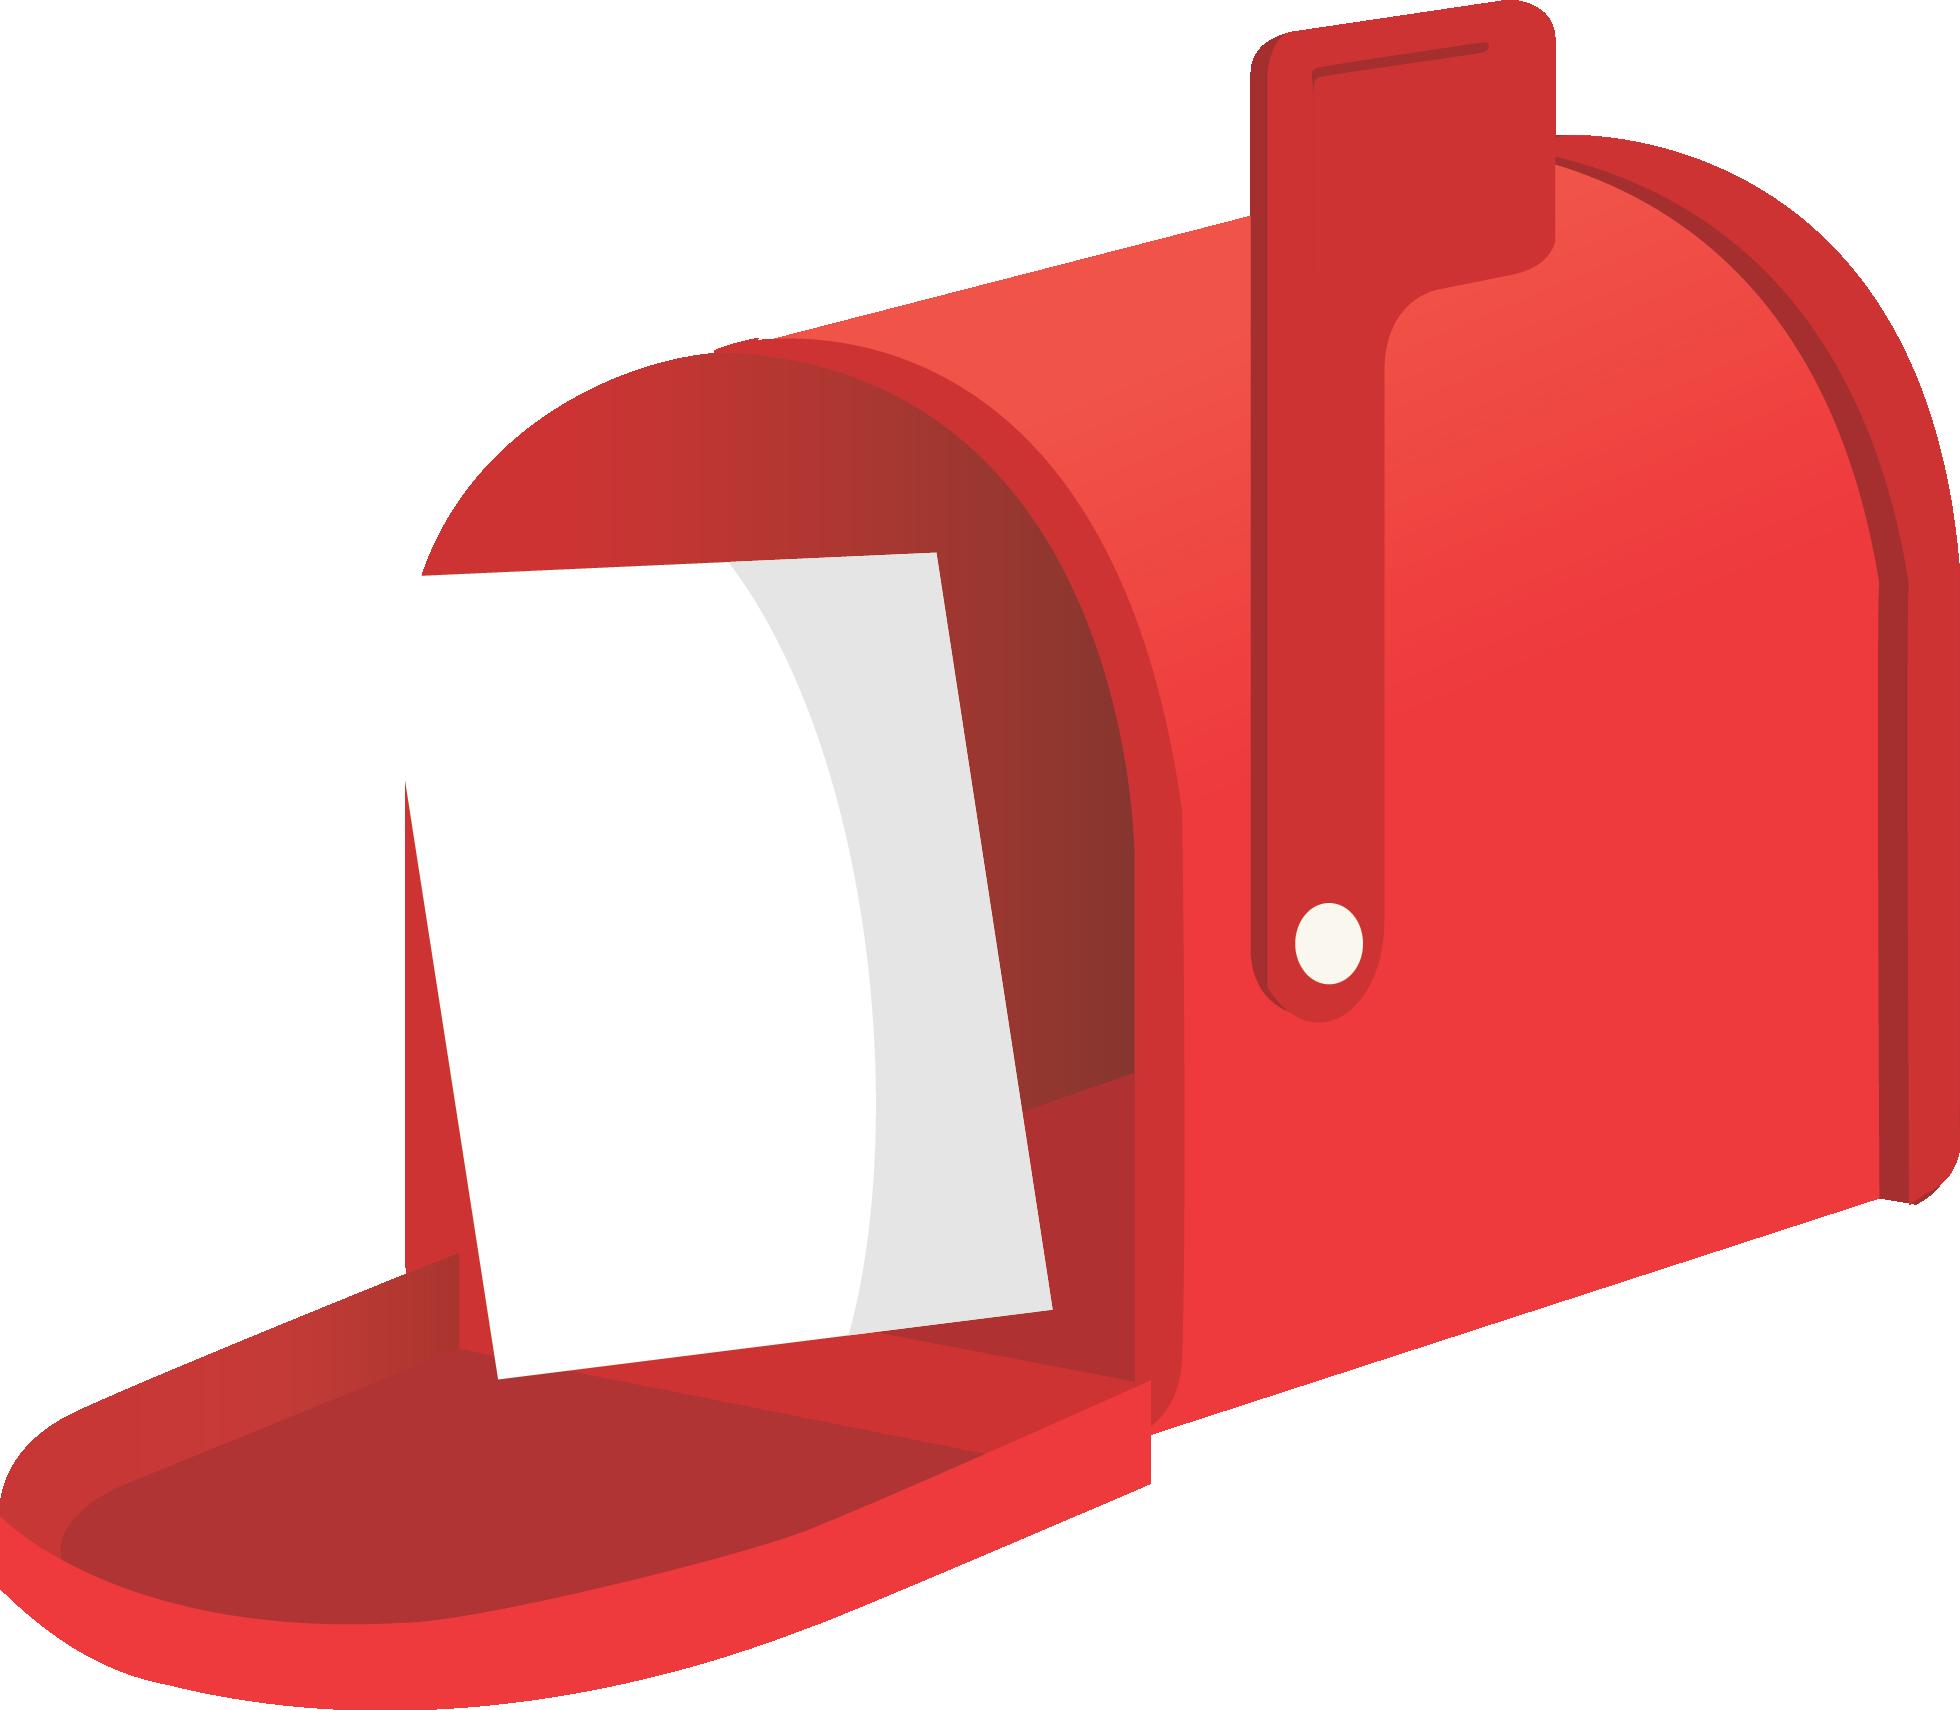 Mailbox PNG Image.